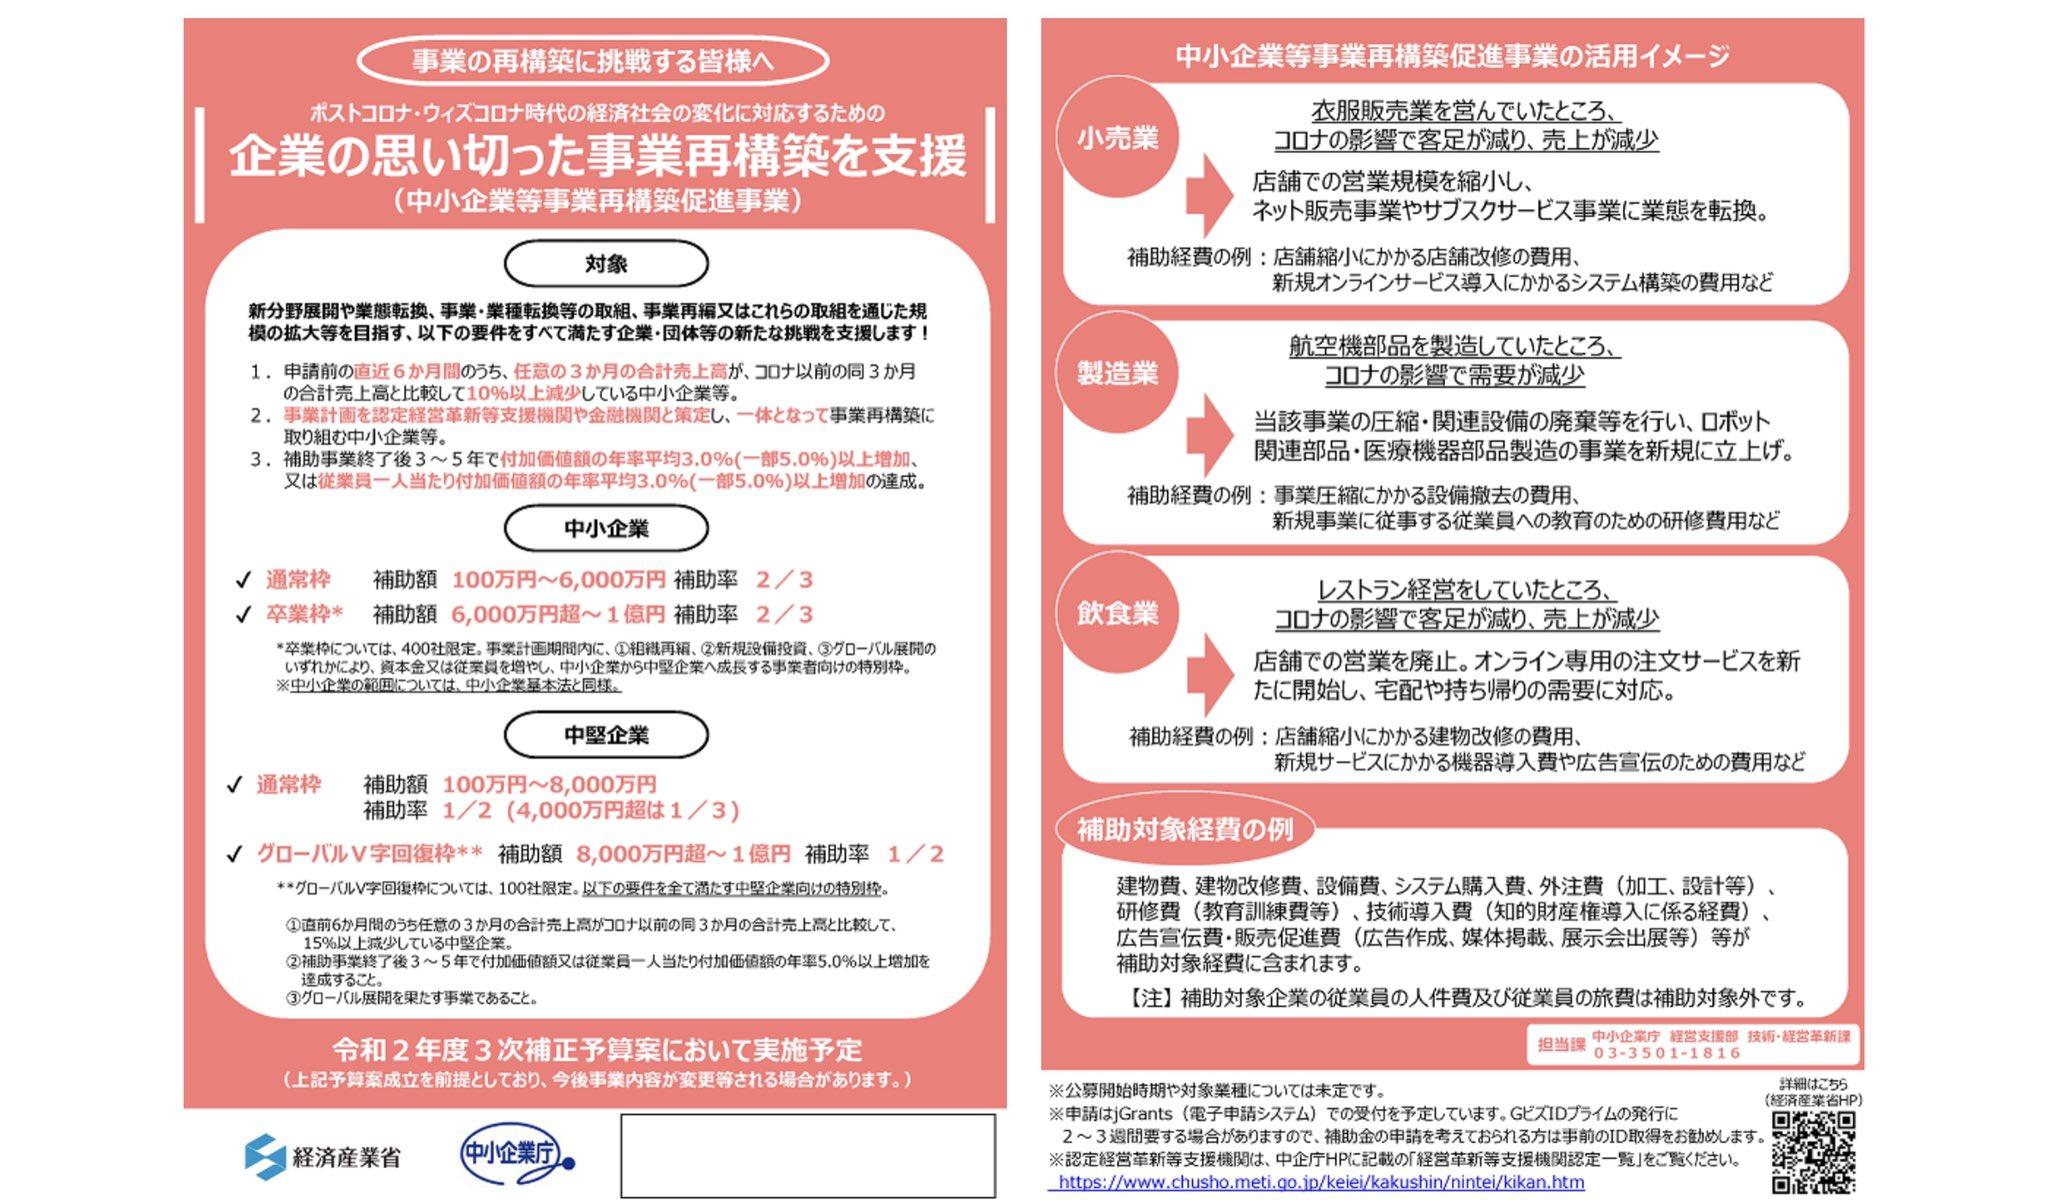 jigyou-saikouchiku-hojokin-leaflet1